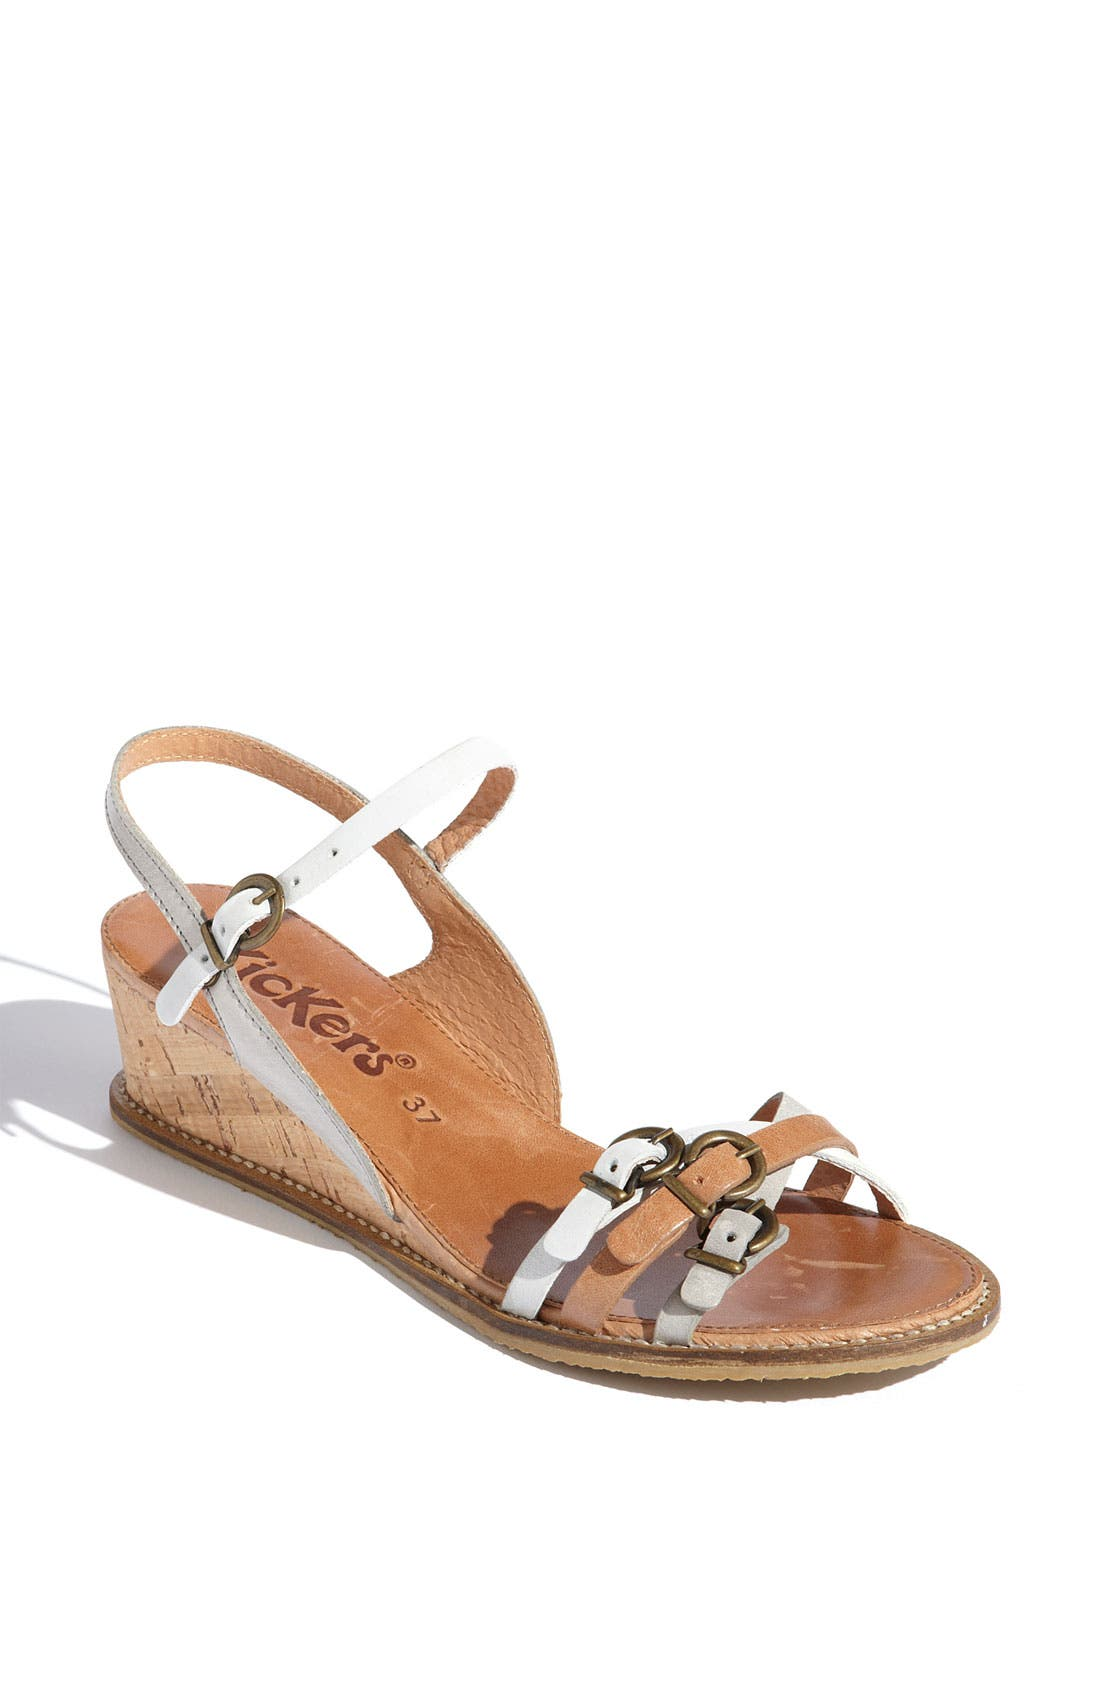 Main Image - Kickers 'Spring' Sandal